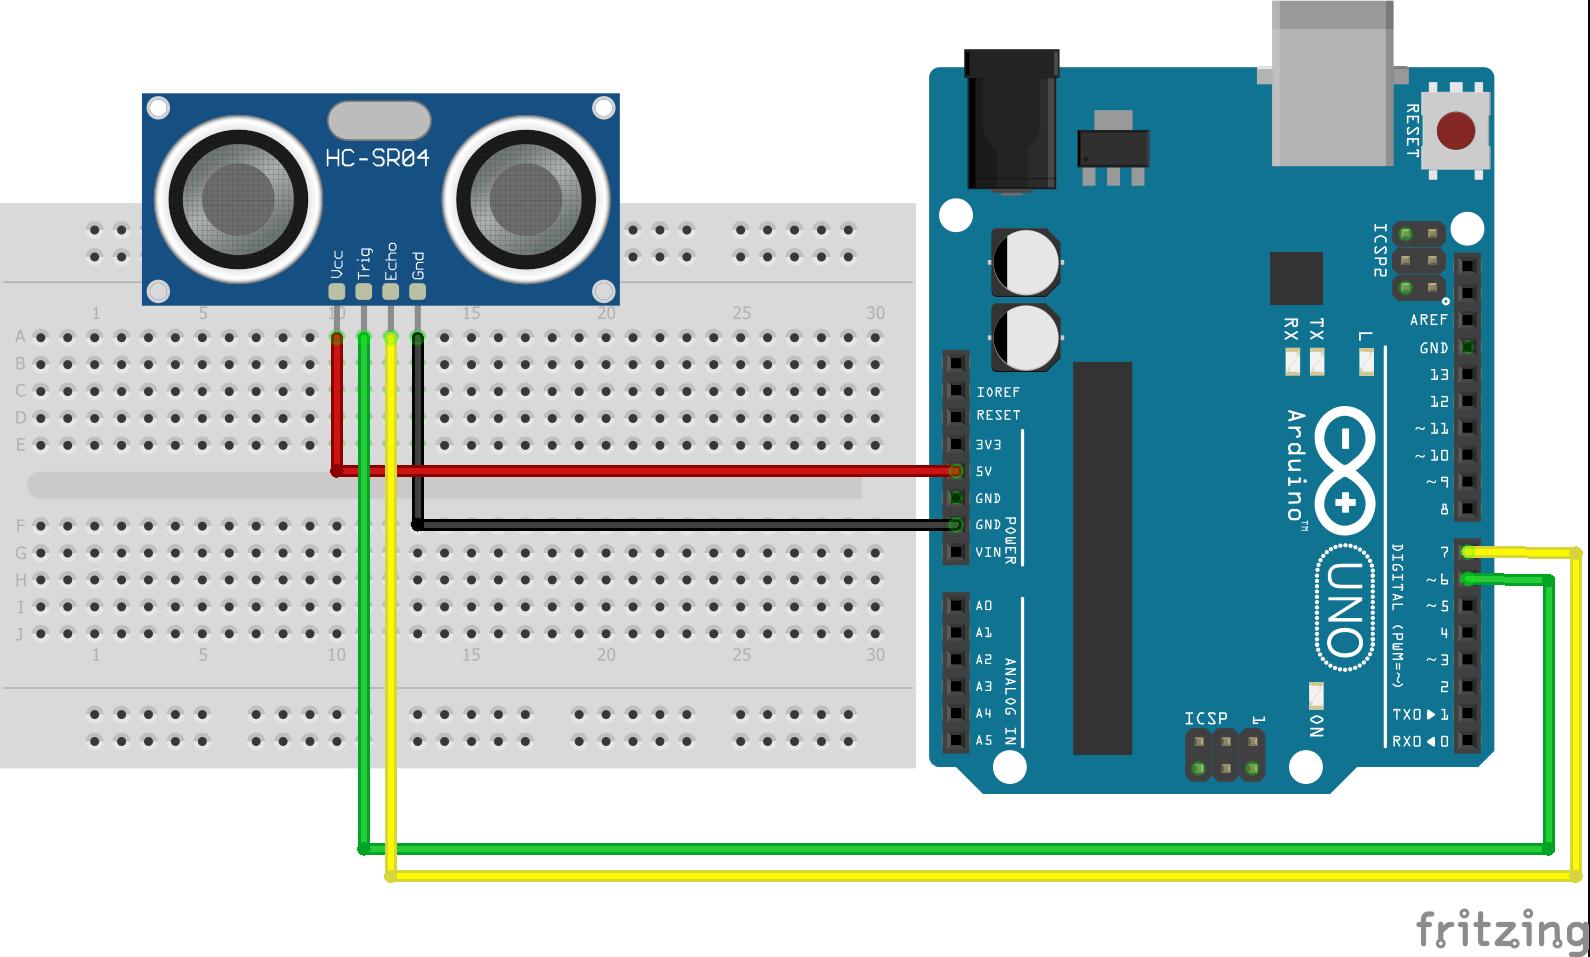 Wiring HC-SR04 Ultrasonic Distance Sensor Arduino Uno